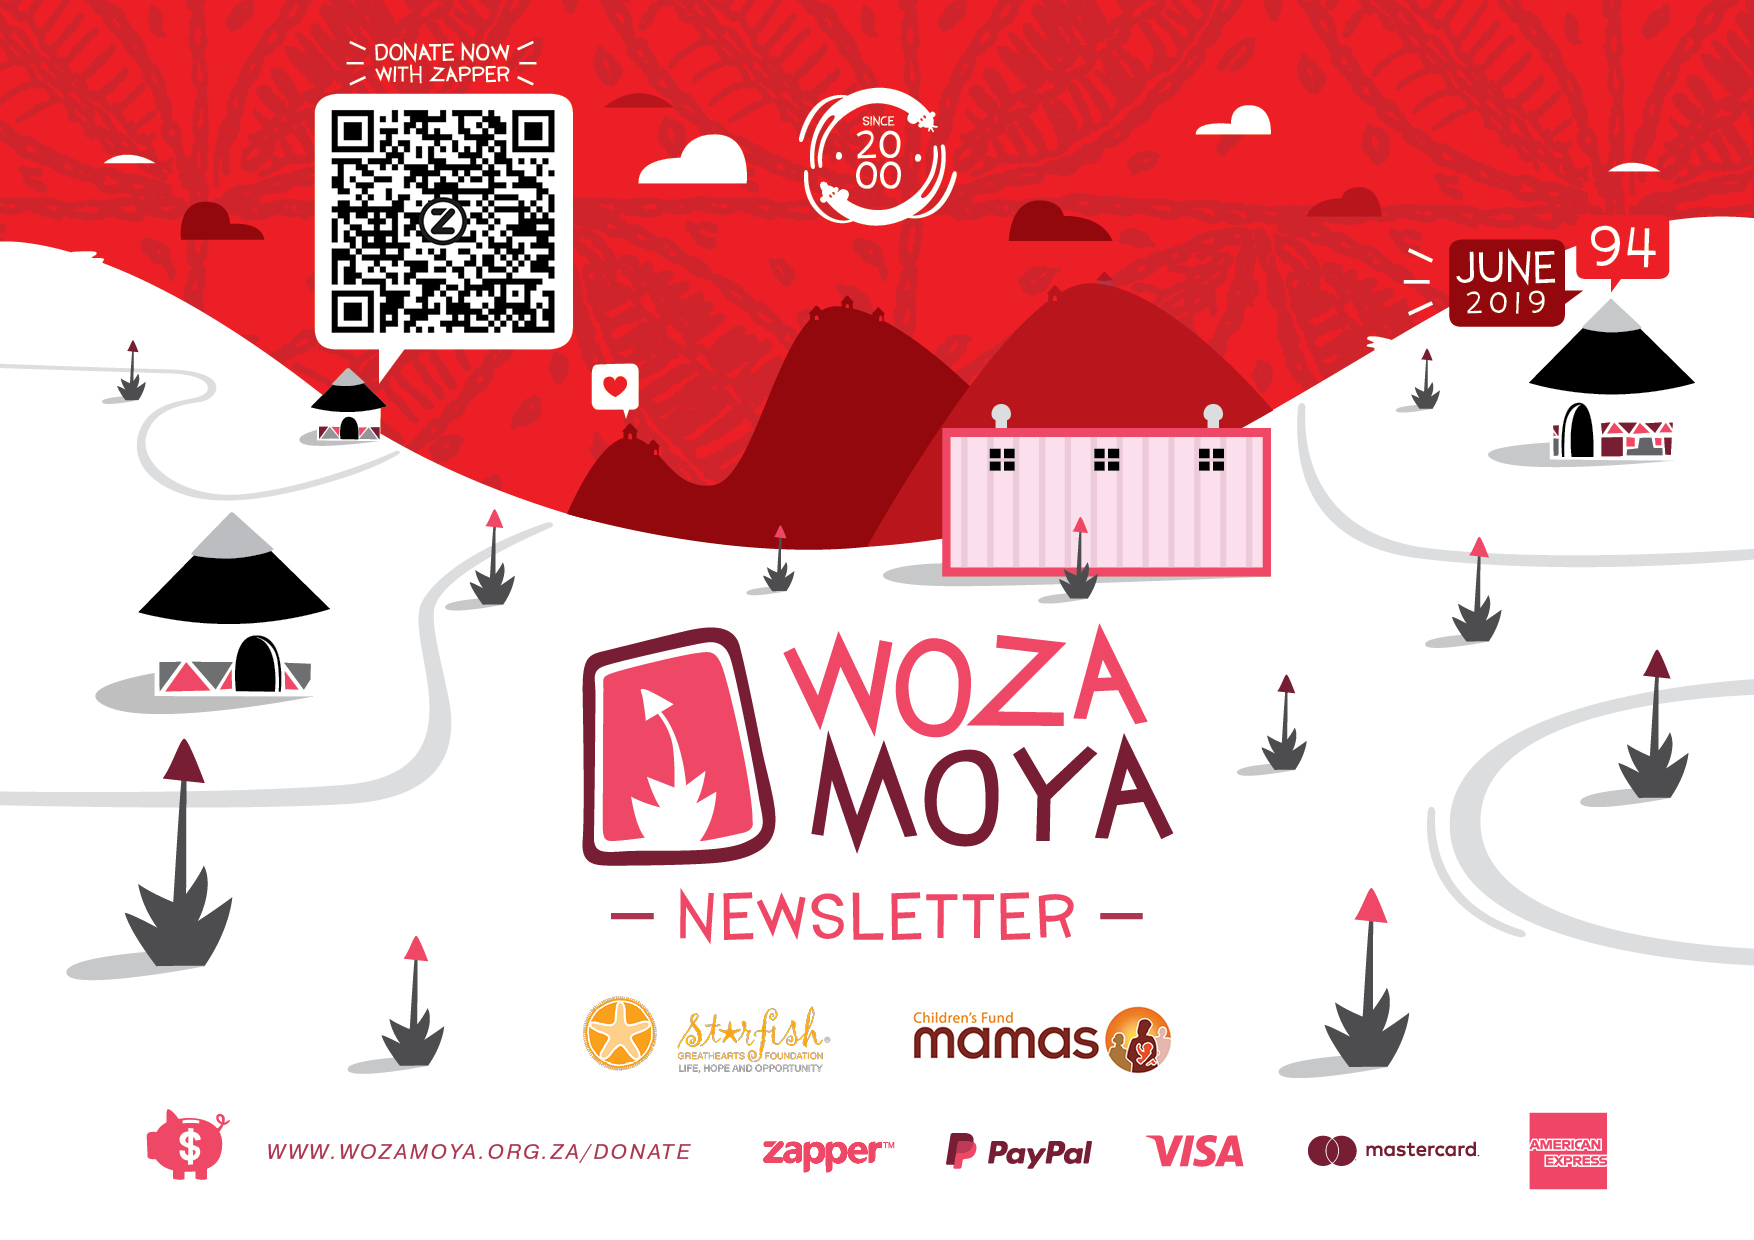 WozaMoya_Newsletter_94.jpg